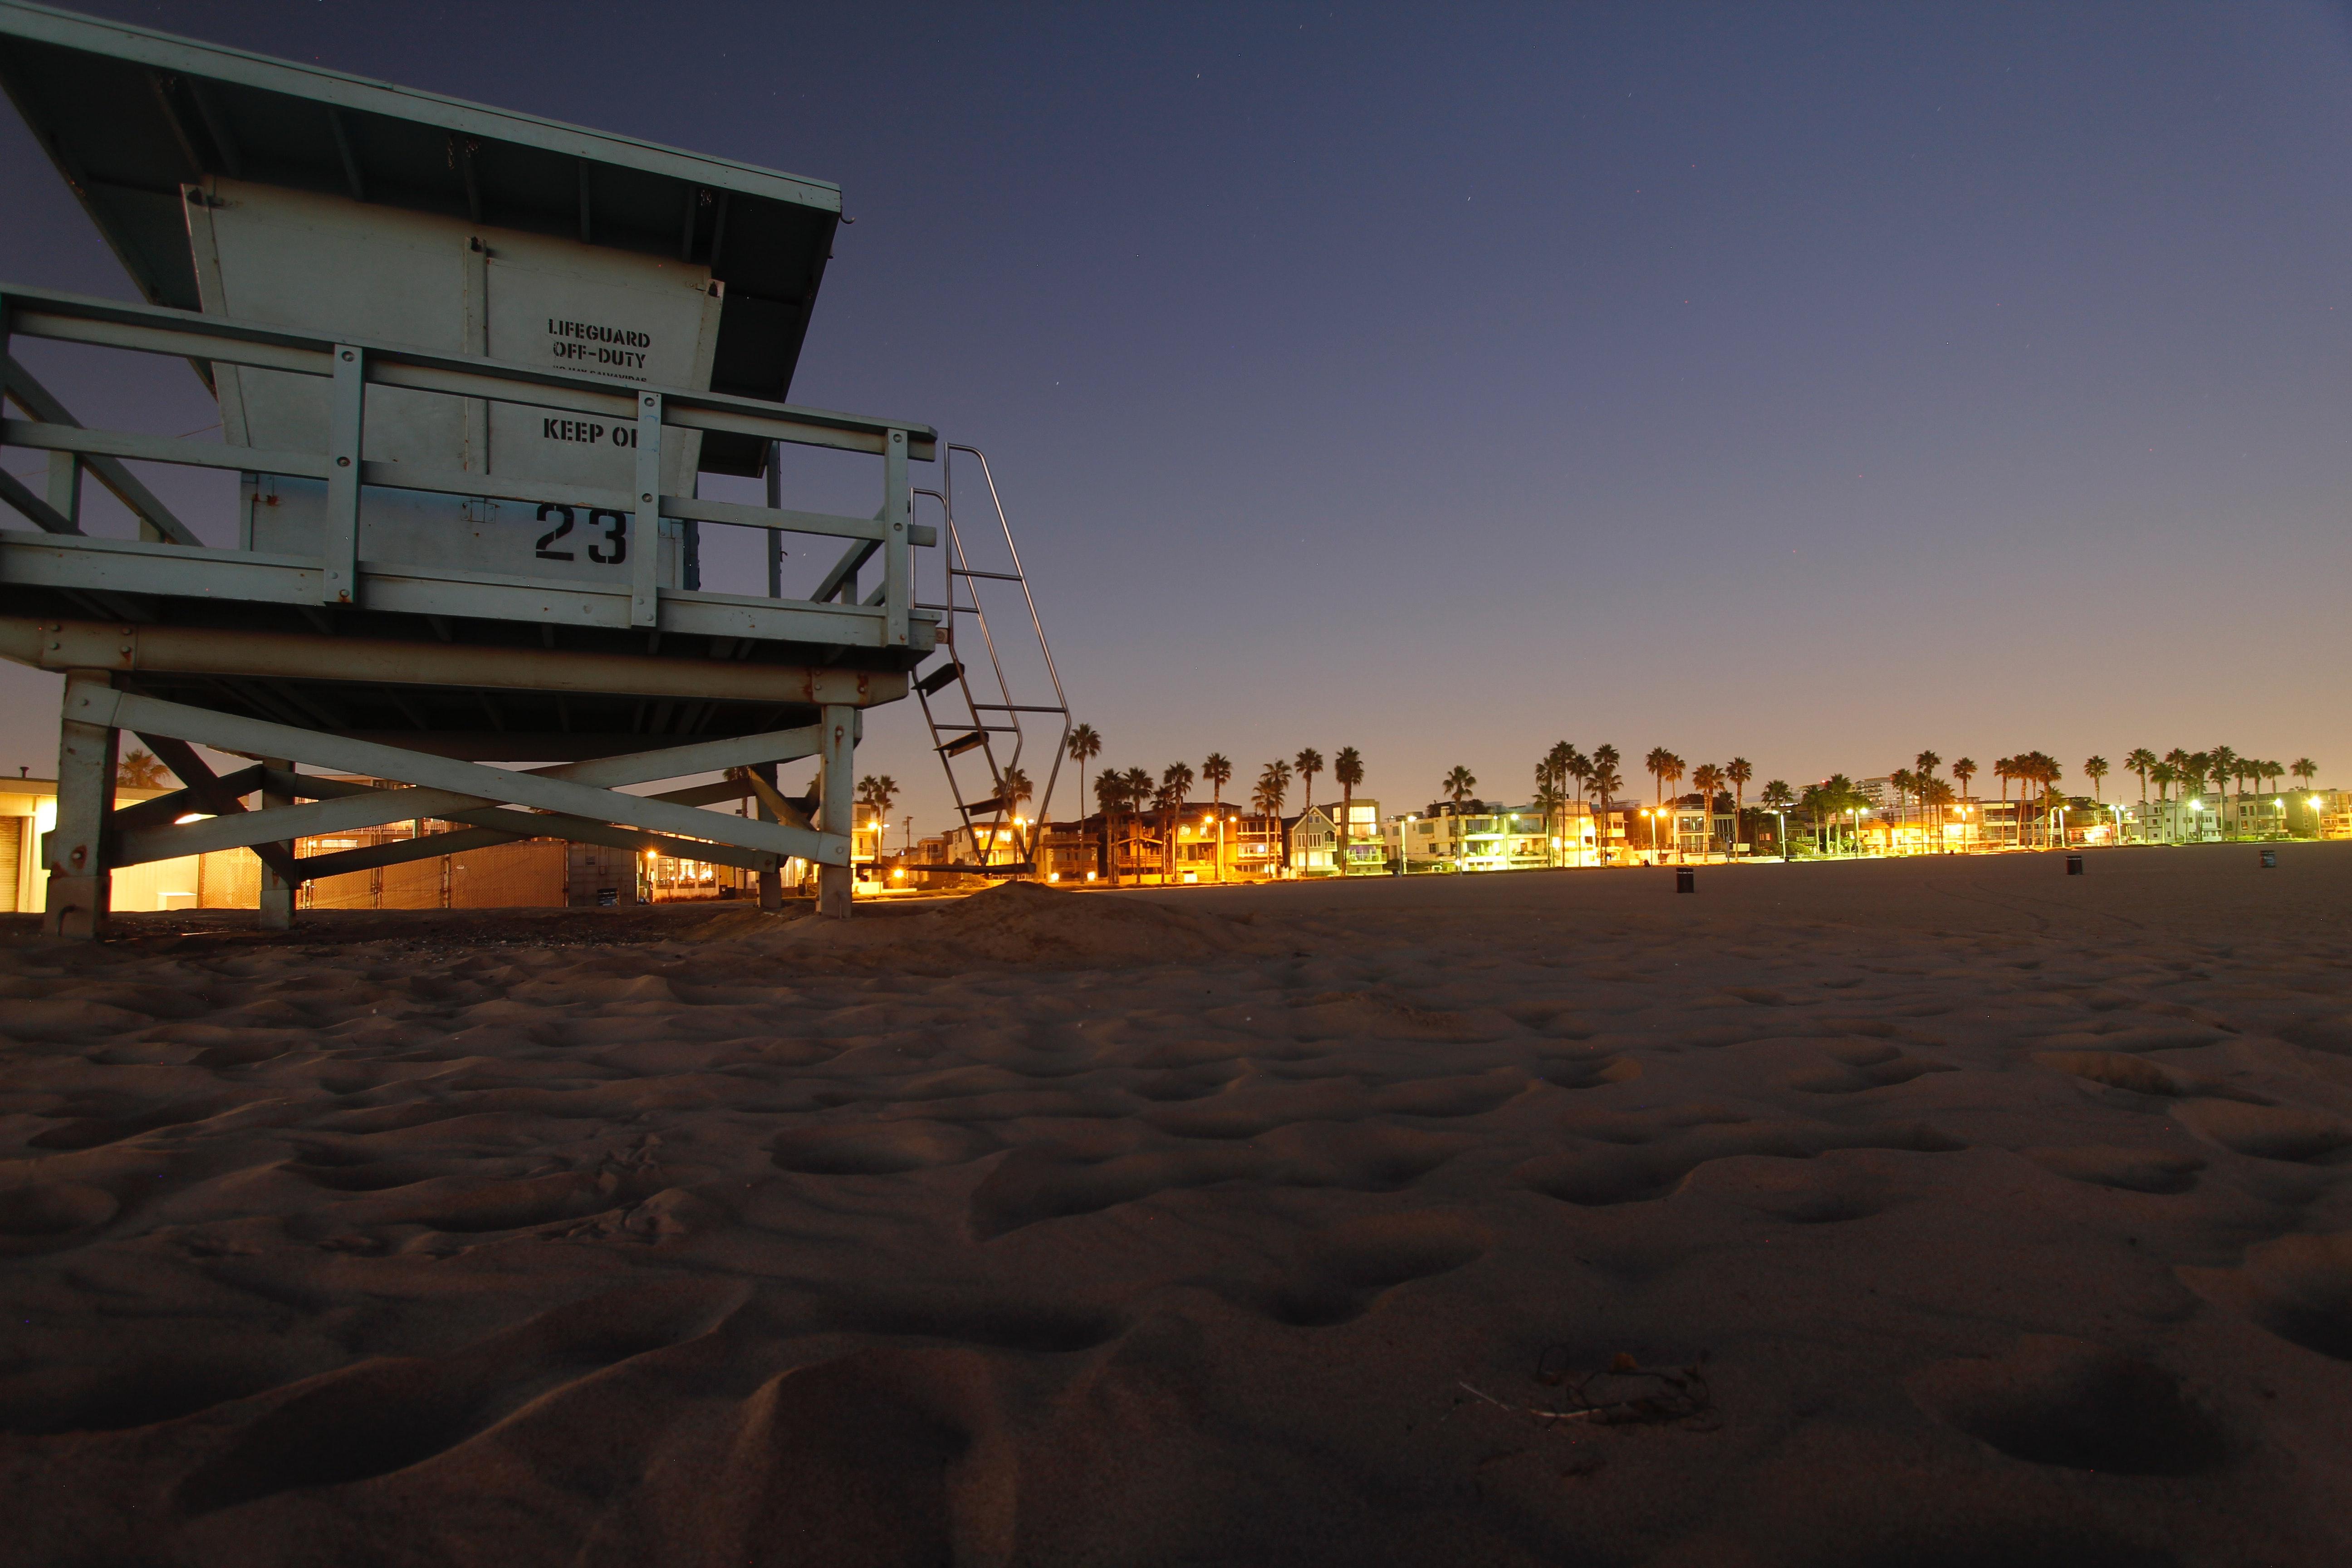 baywatch-beach-coast-61106.jpg